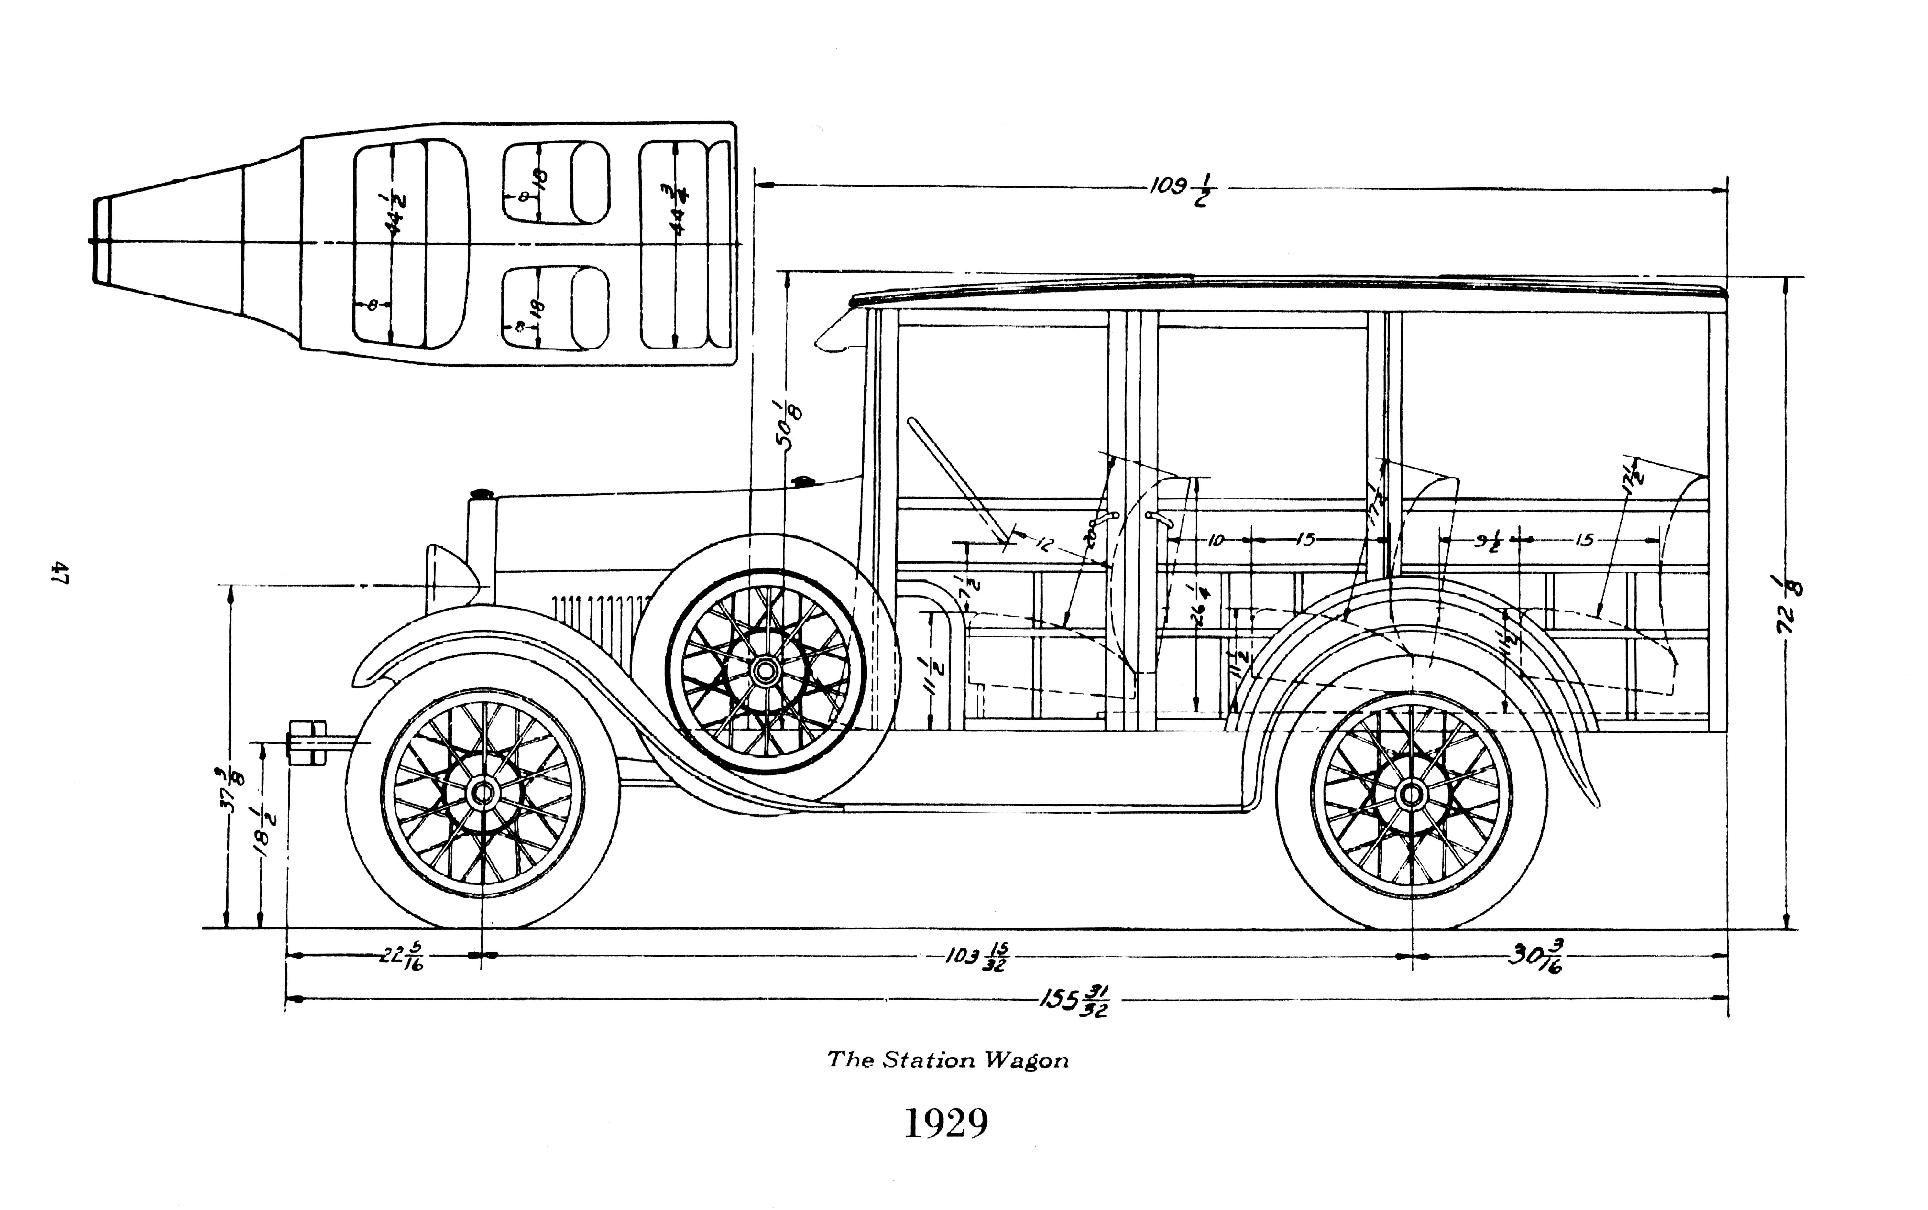 1929-Ford-Model-A-Station-Wagon.jpg (JPEG Image, 1928